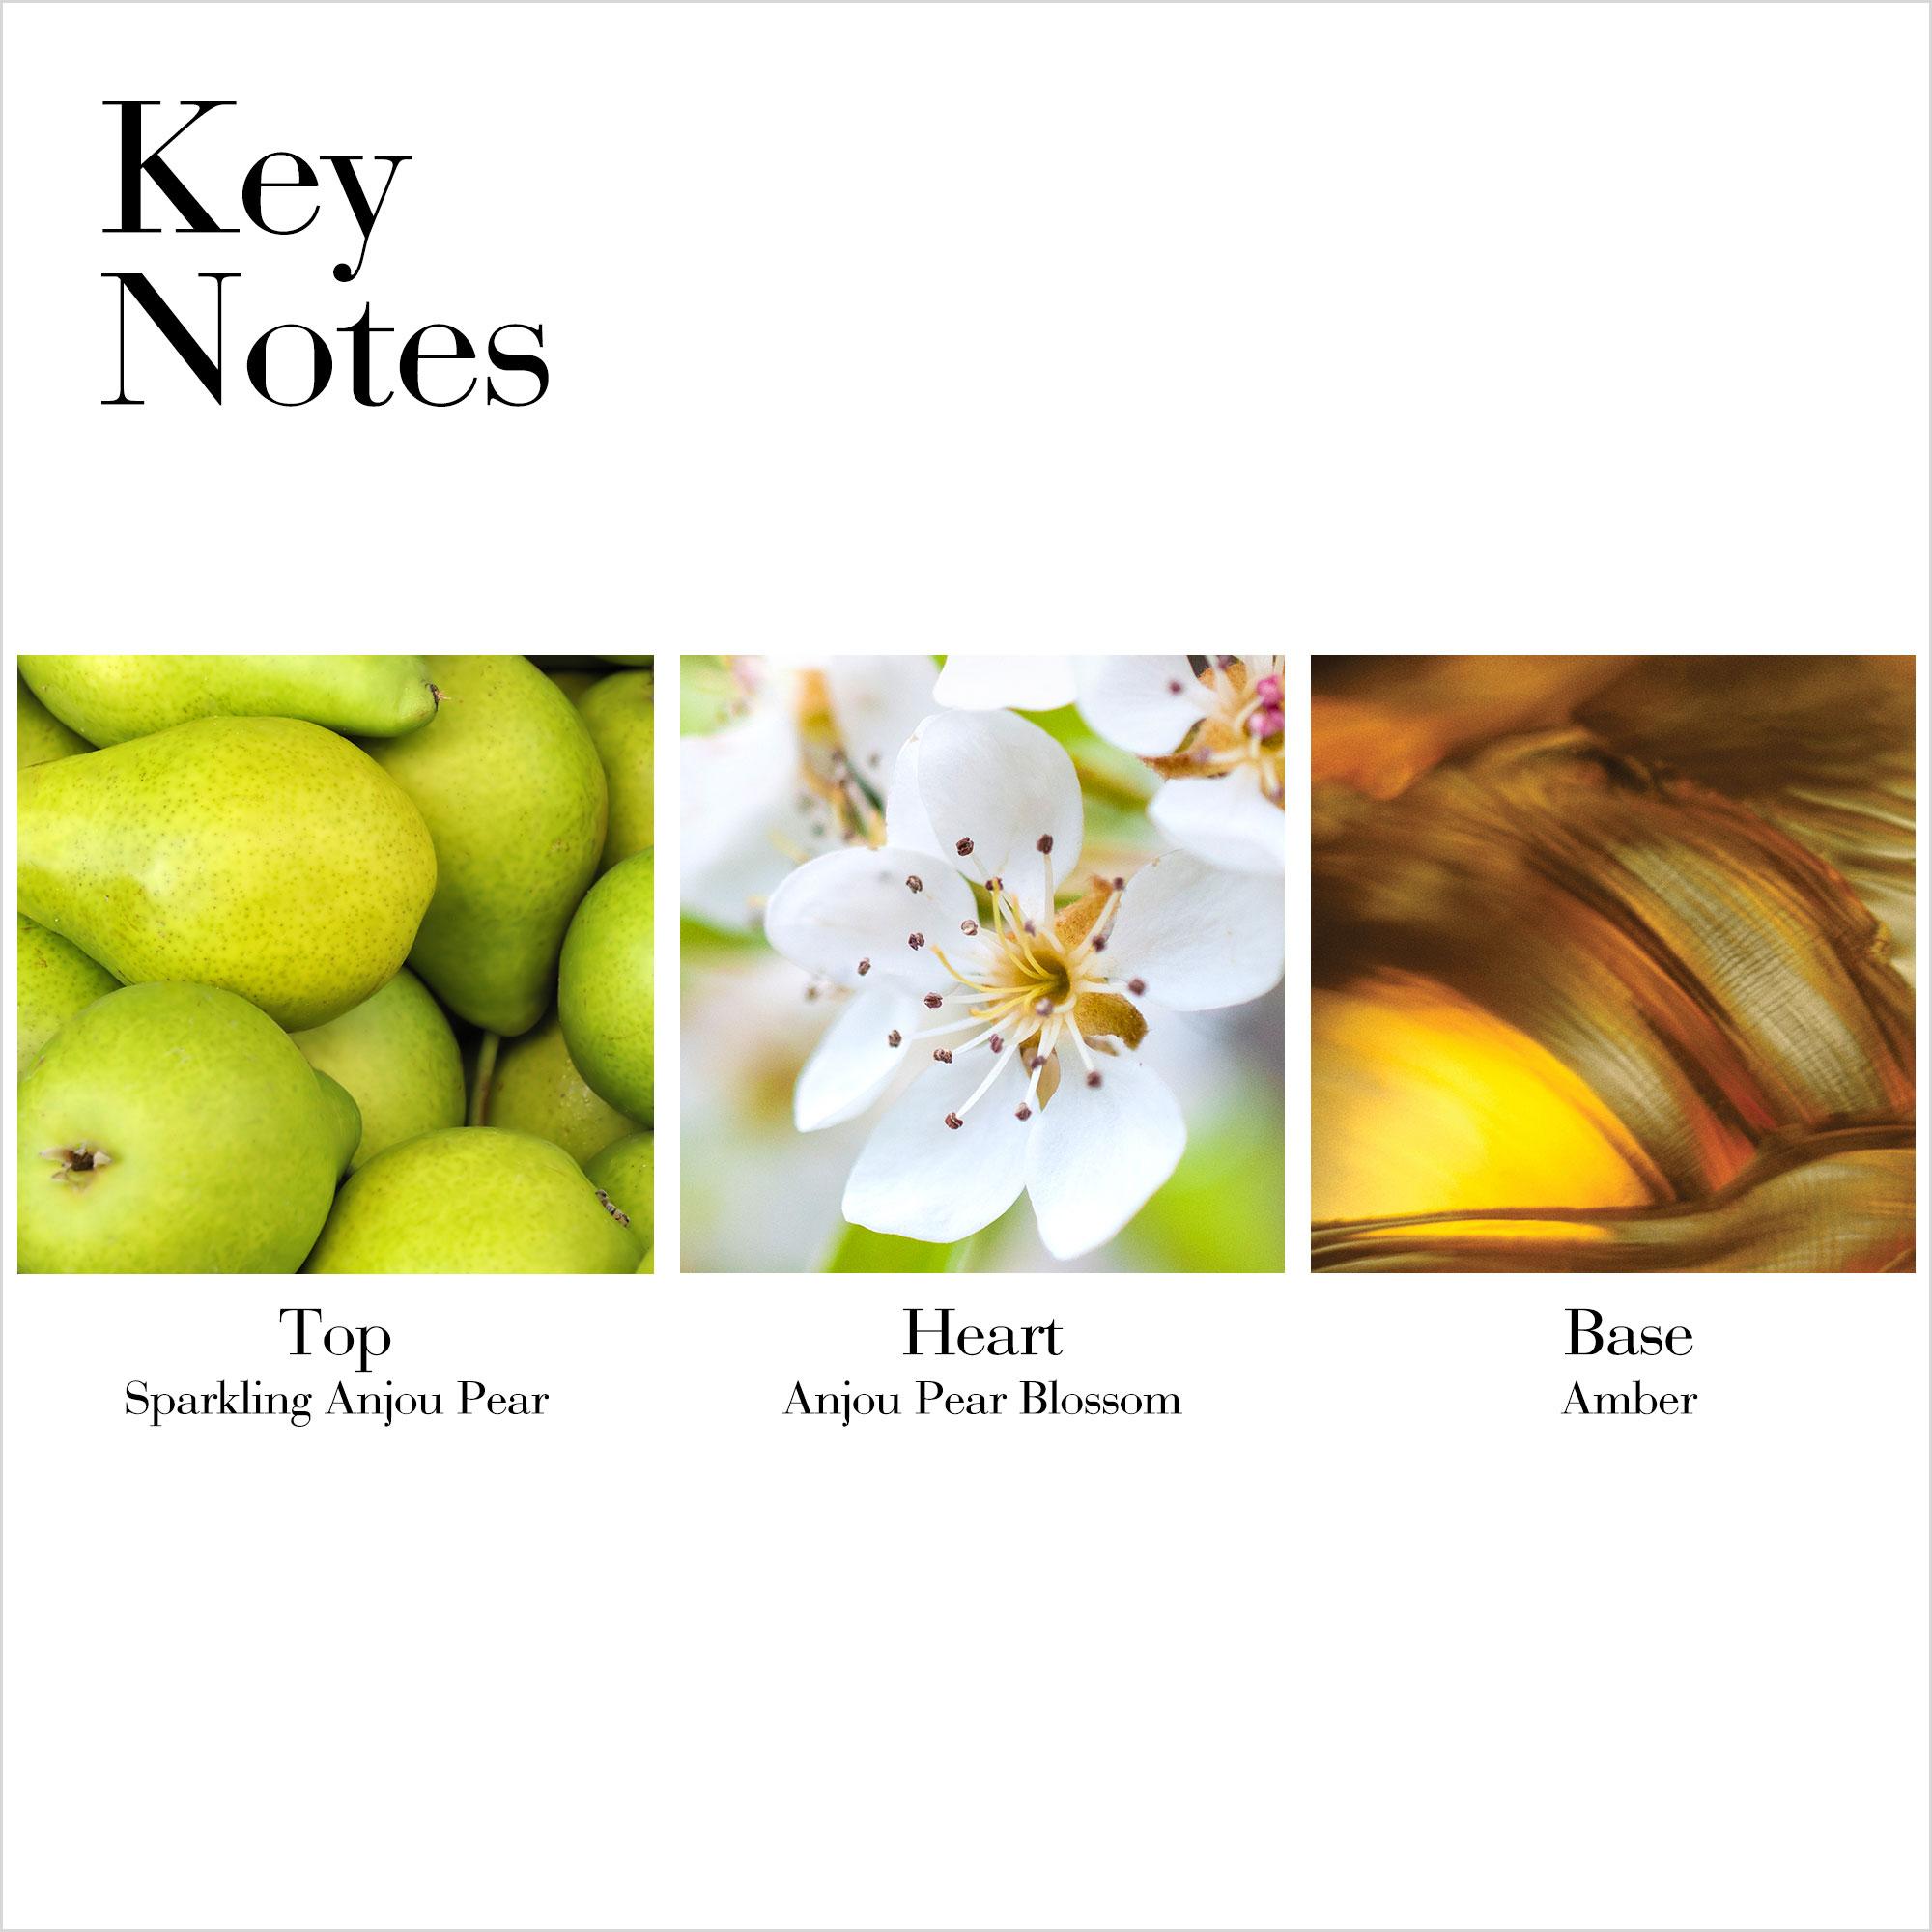 Key Notes- Top Sparkling Anjou Pear, Heart Anjou Pear Blossom, Base Amber